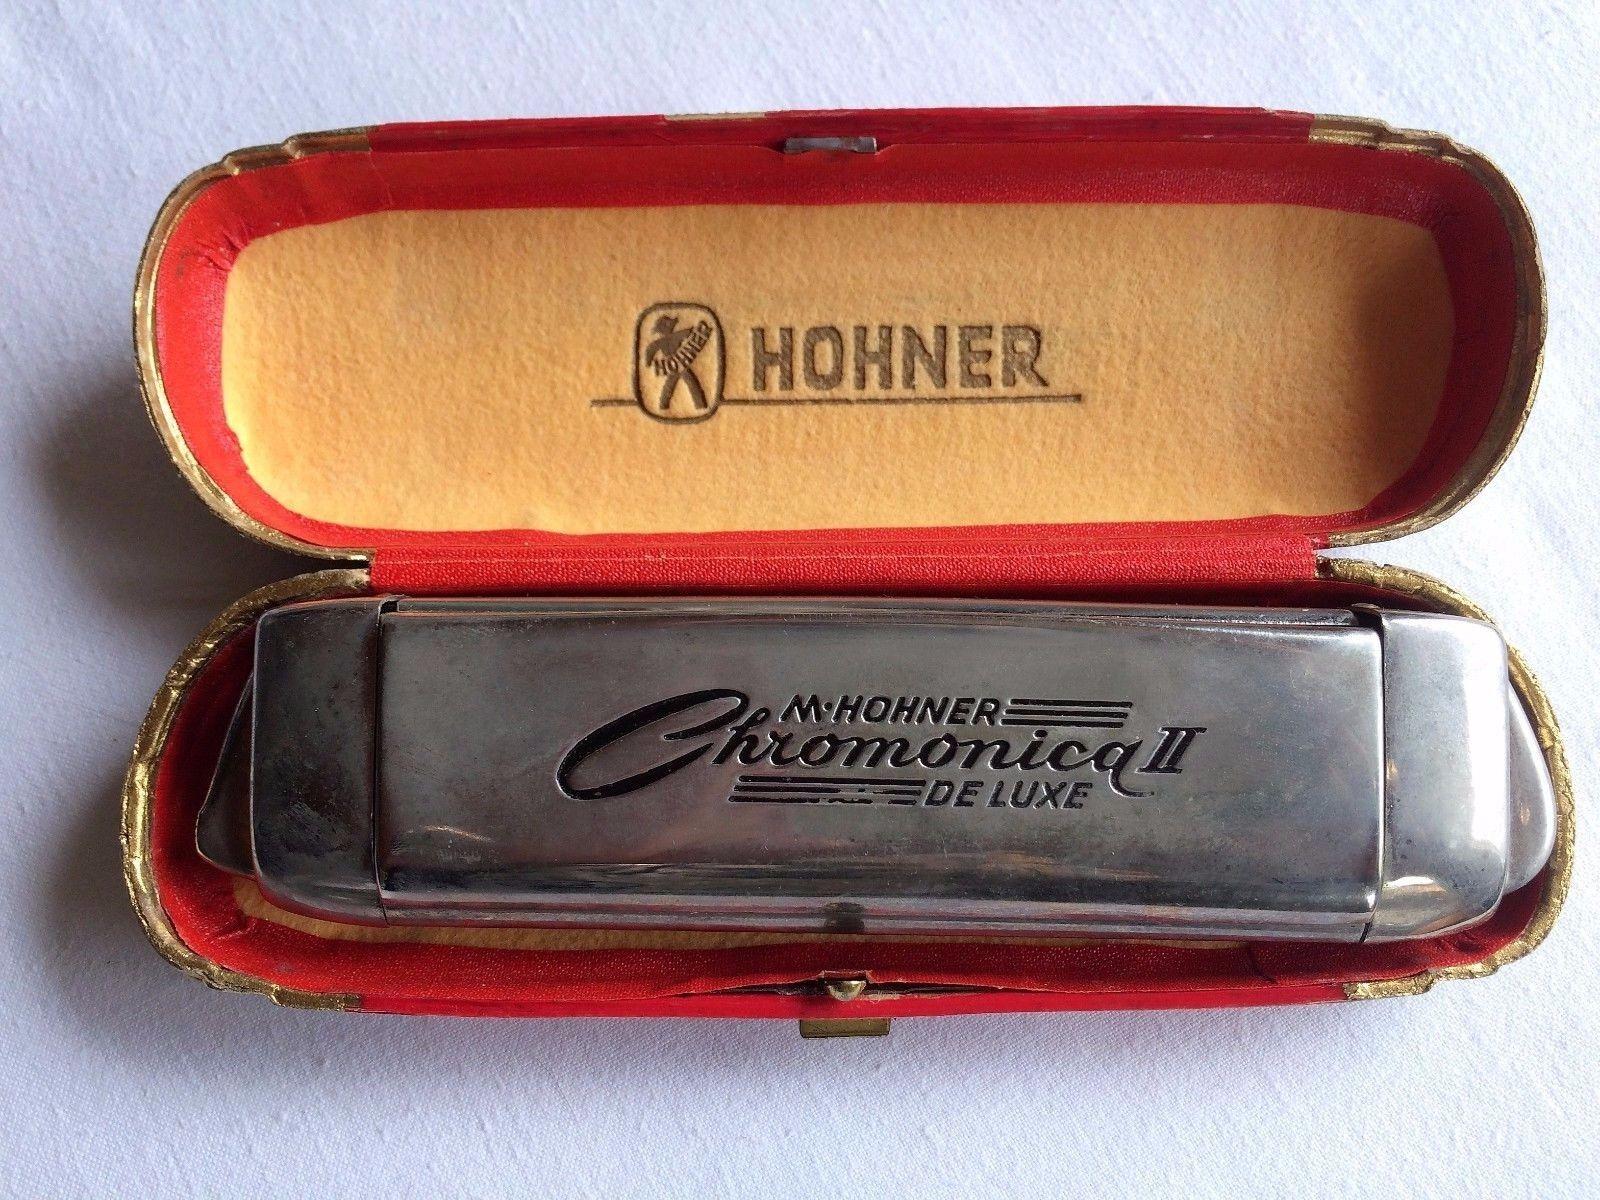 M. Hohner Chromonica 2 de luxe, Dachbodenfund, konvolut, sammeln, rar